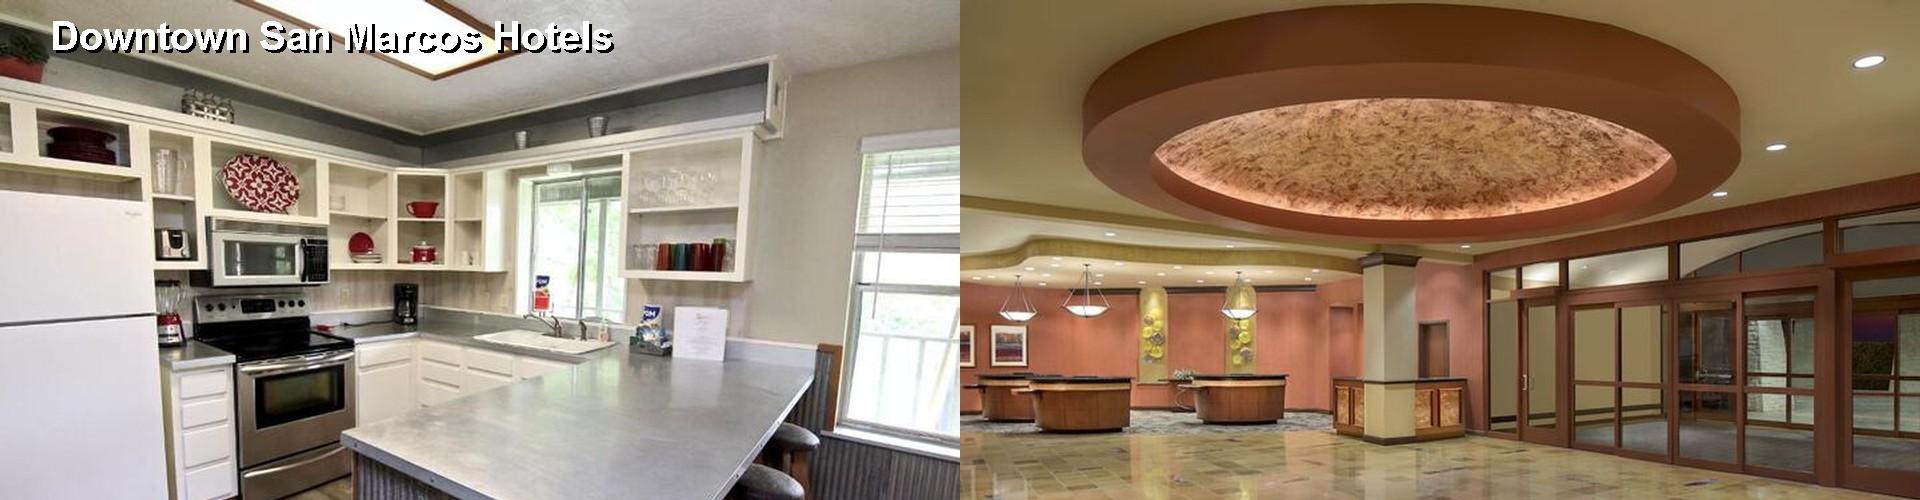 4 Best Hotels Near Downtown San Marcos